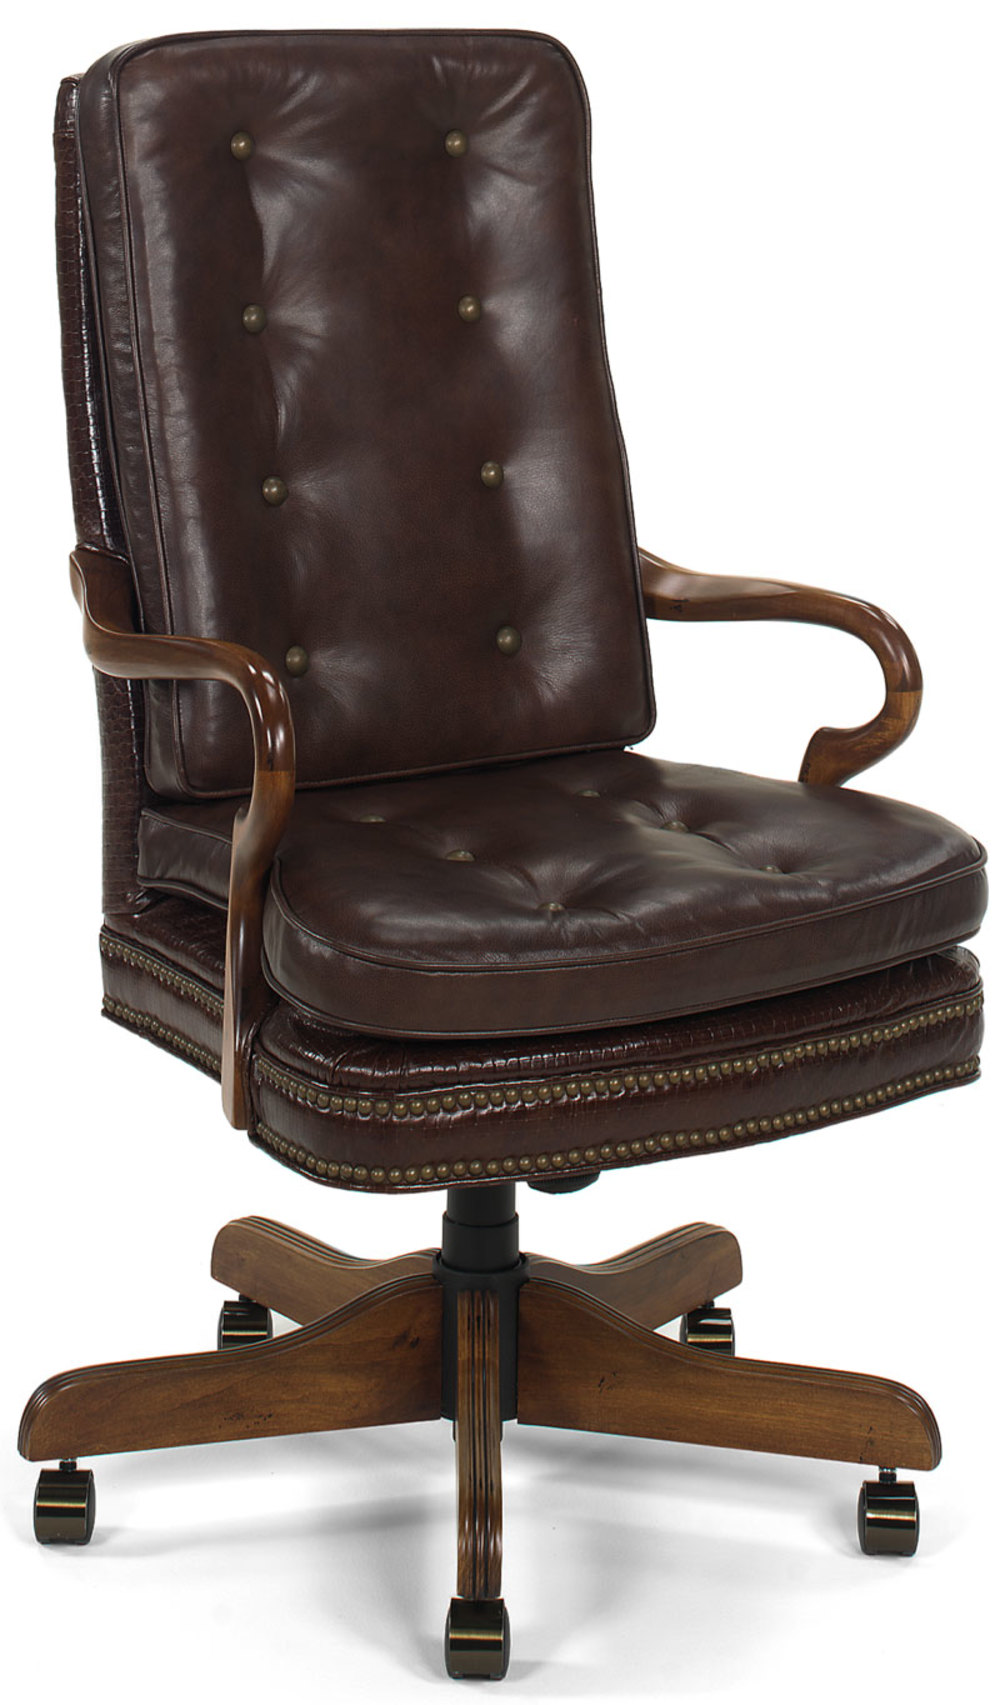 Parker Southern - Coolidge Tilt Swivel Chair